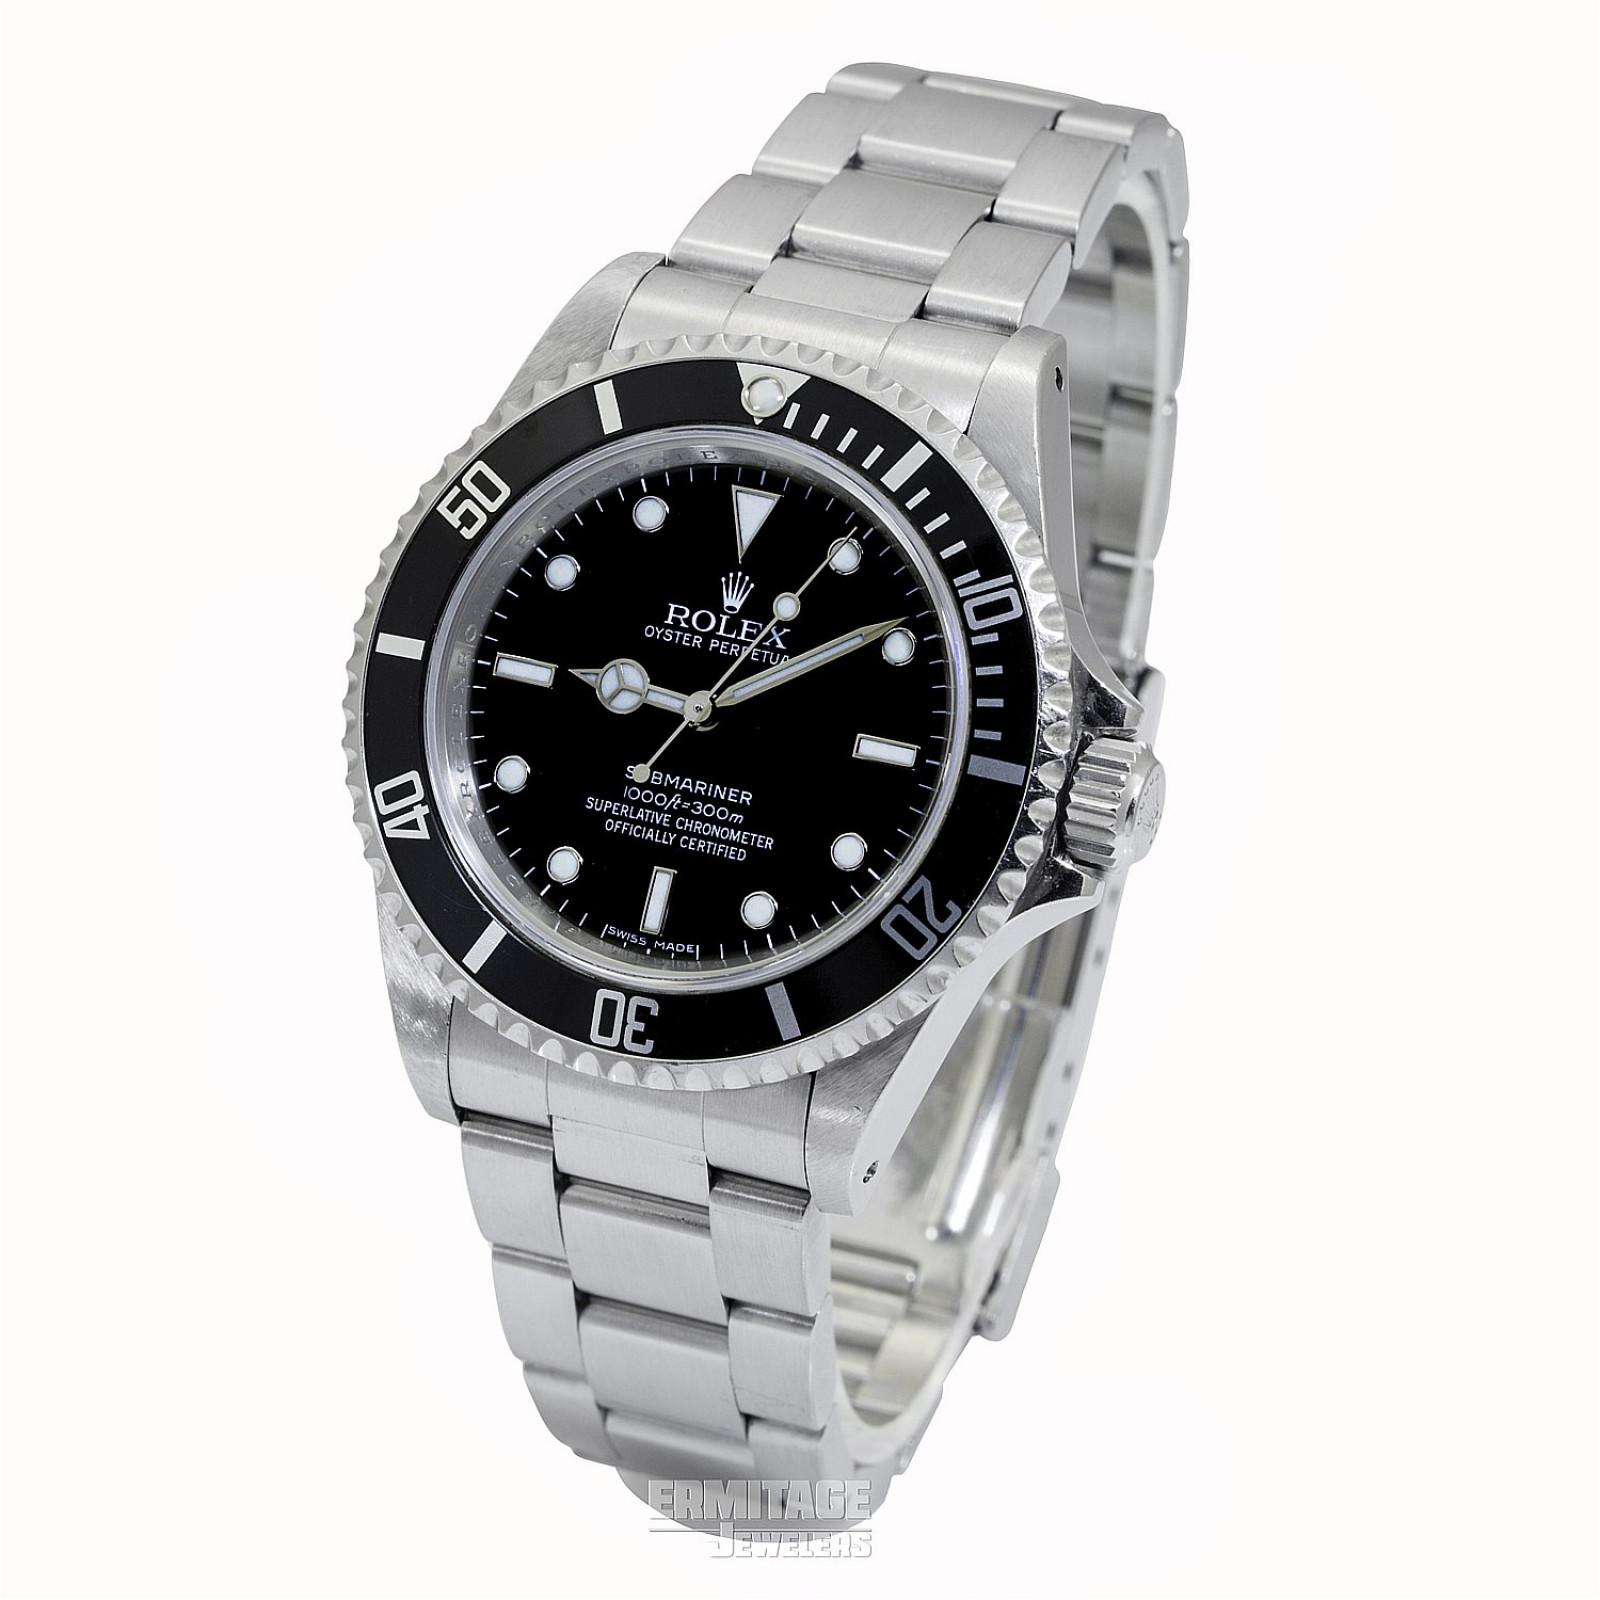 2009 Rolex Submariner No Date Ref. 14060 4 Lines Dial